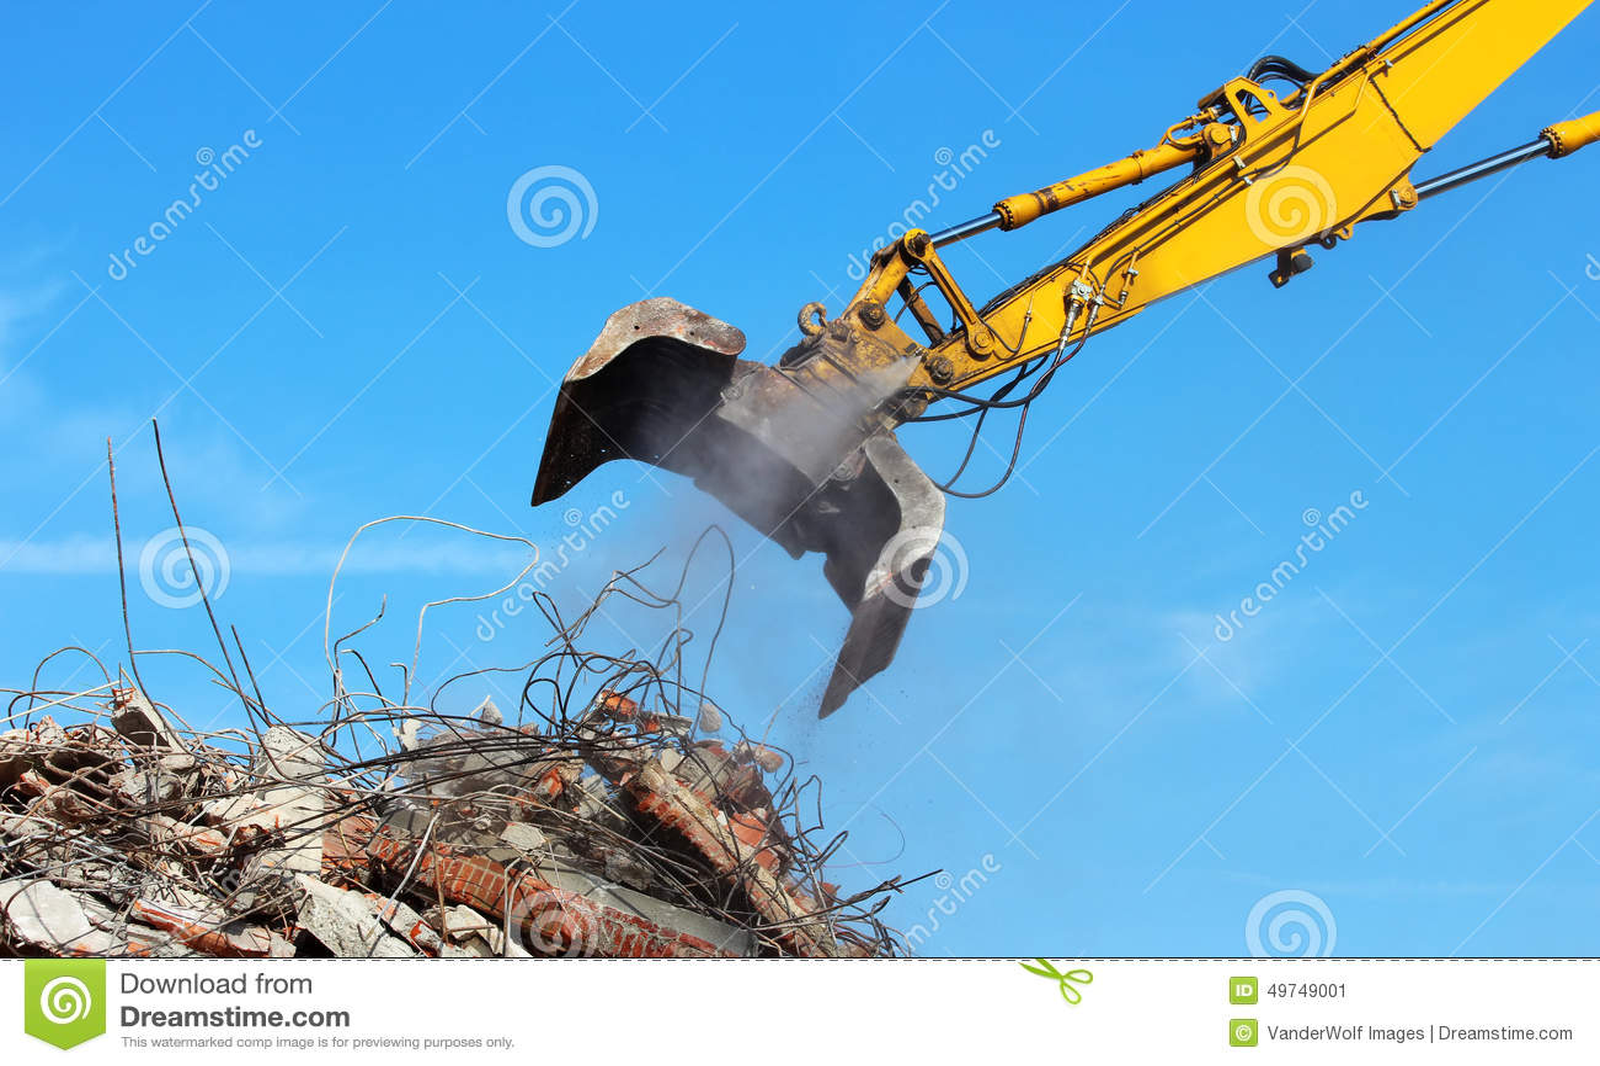 Building Demolition Cartoon : Demolition royalty free stock image cartoondealer